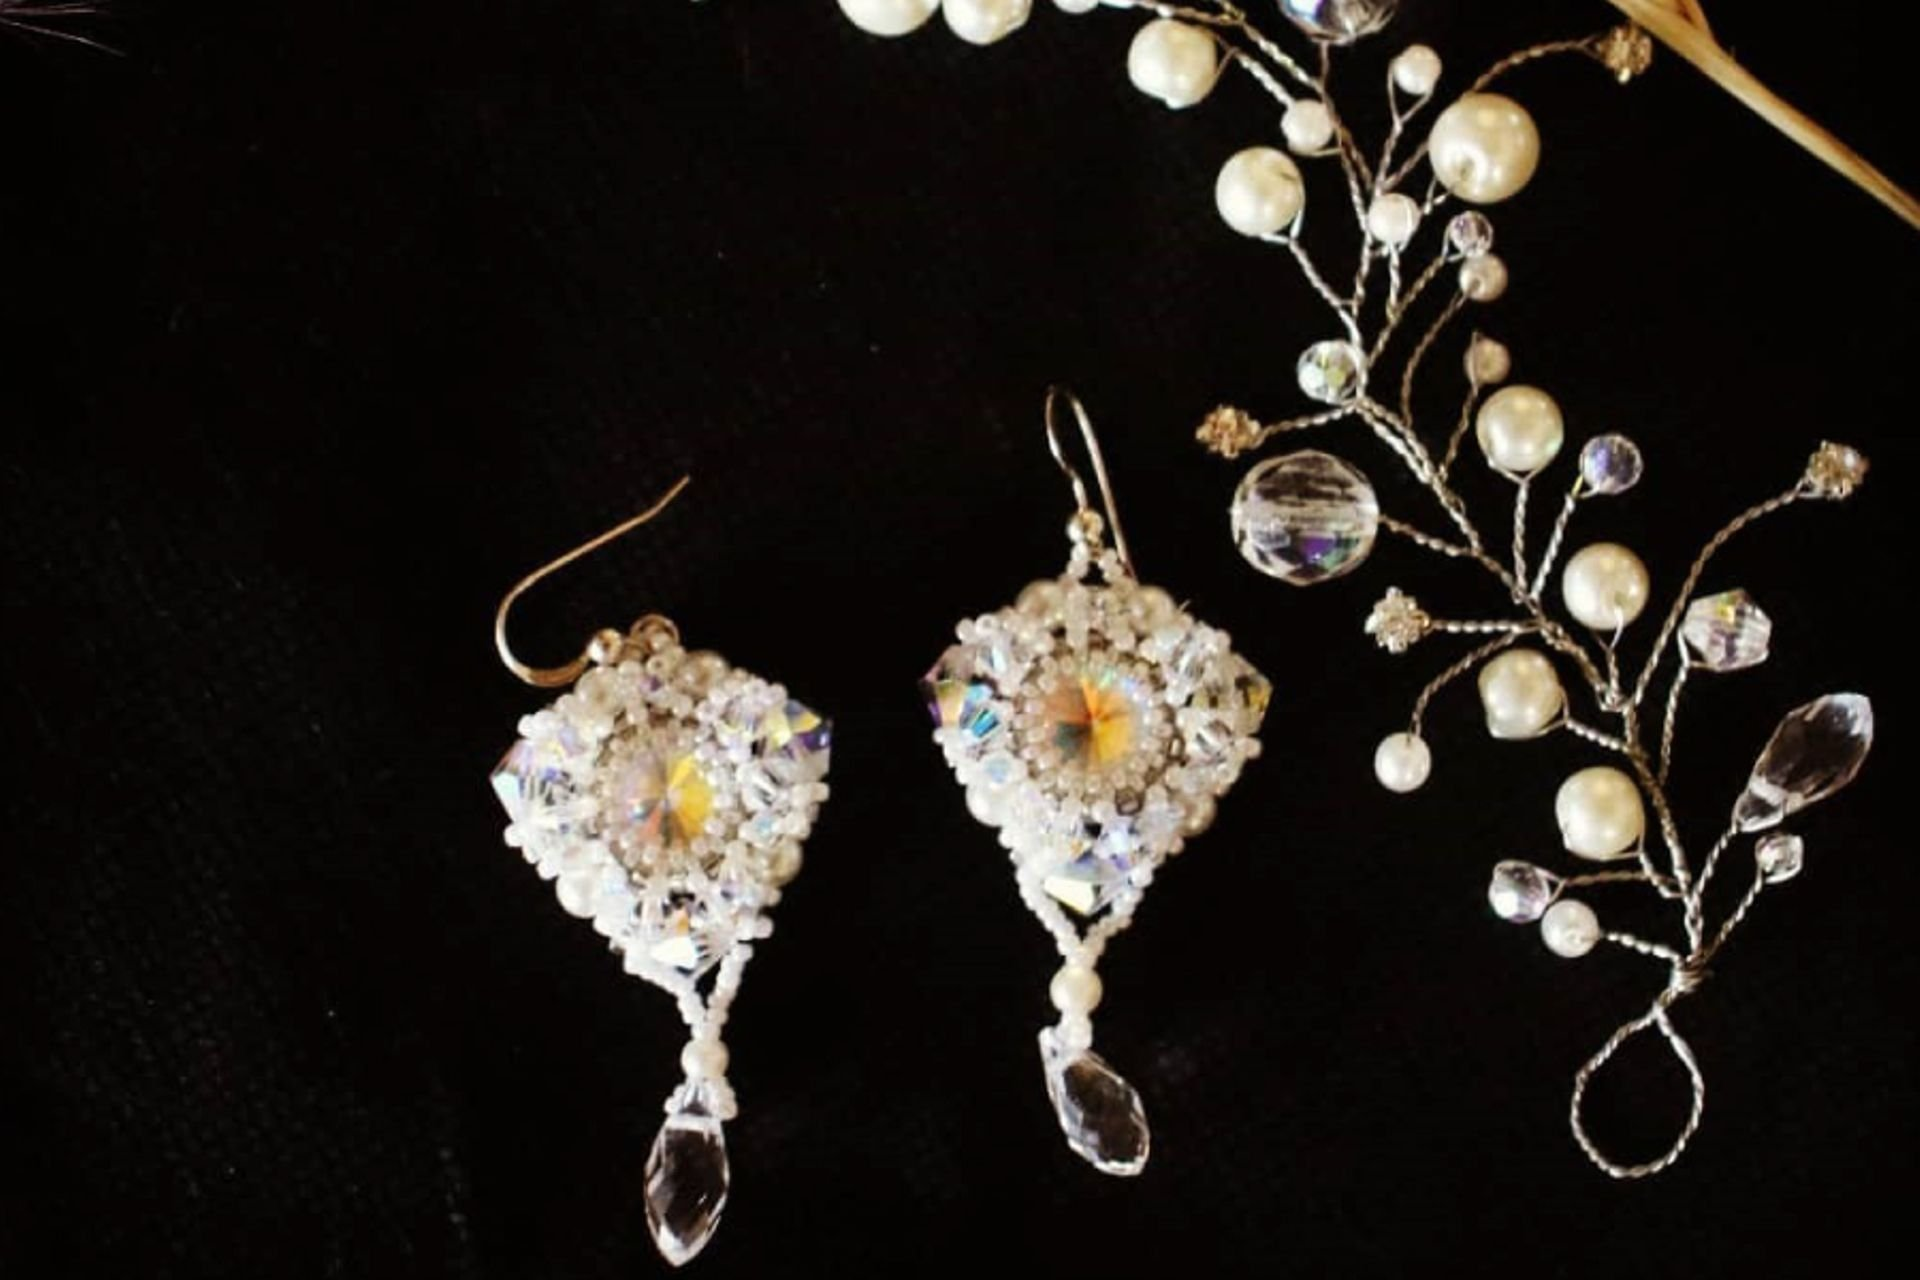 4 lantana beads jewelry designer תְמוּנָה